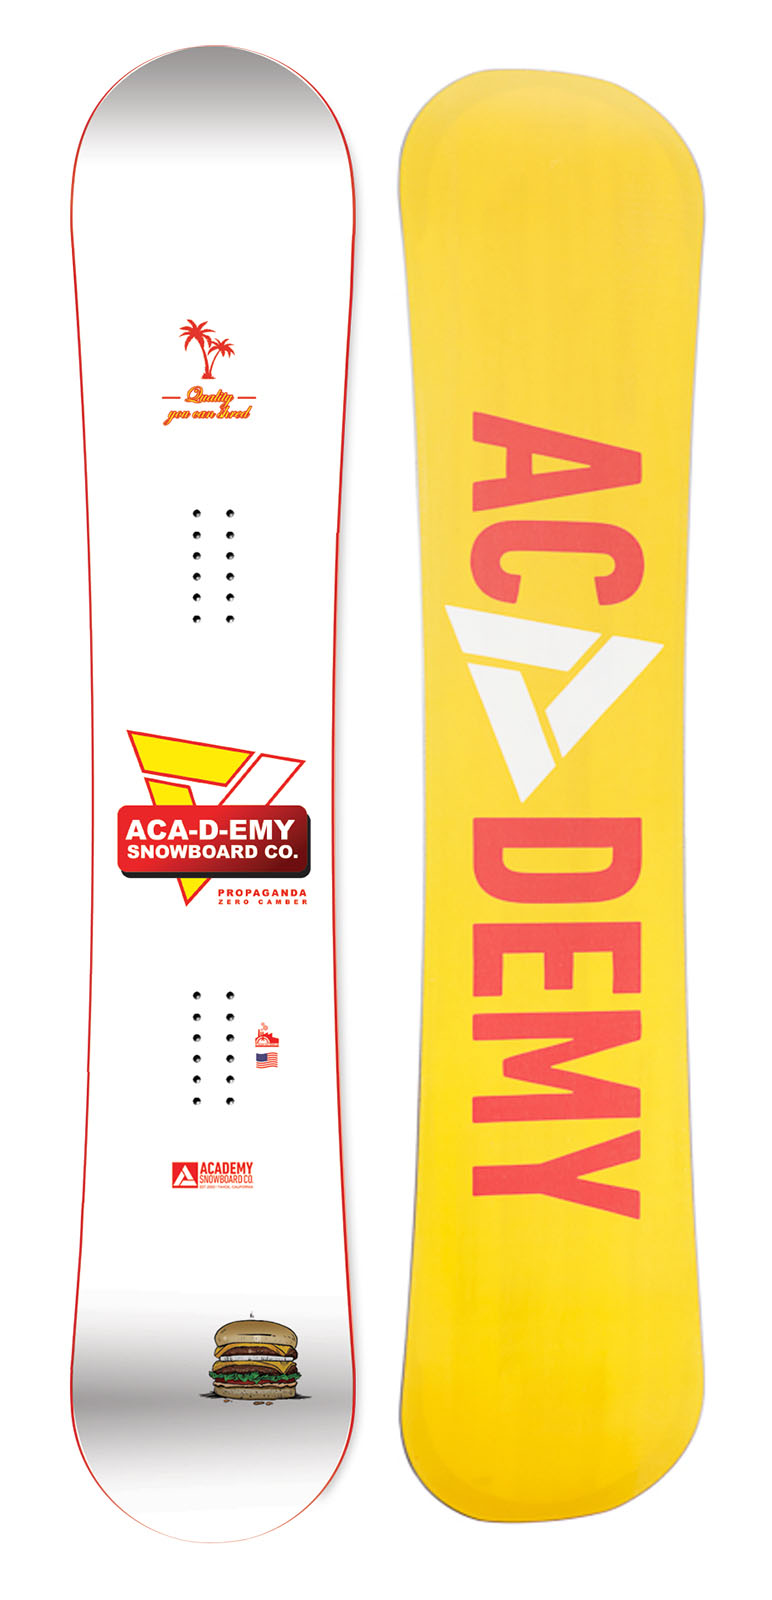 Academy Propaganda Zero Camber Snowboard 146cm 2020